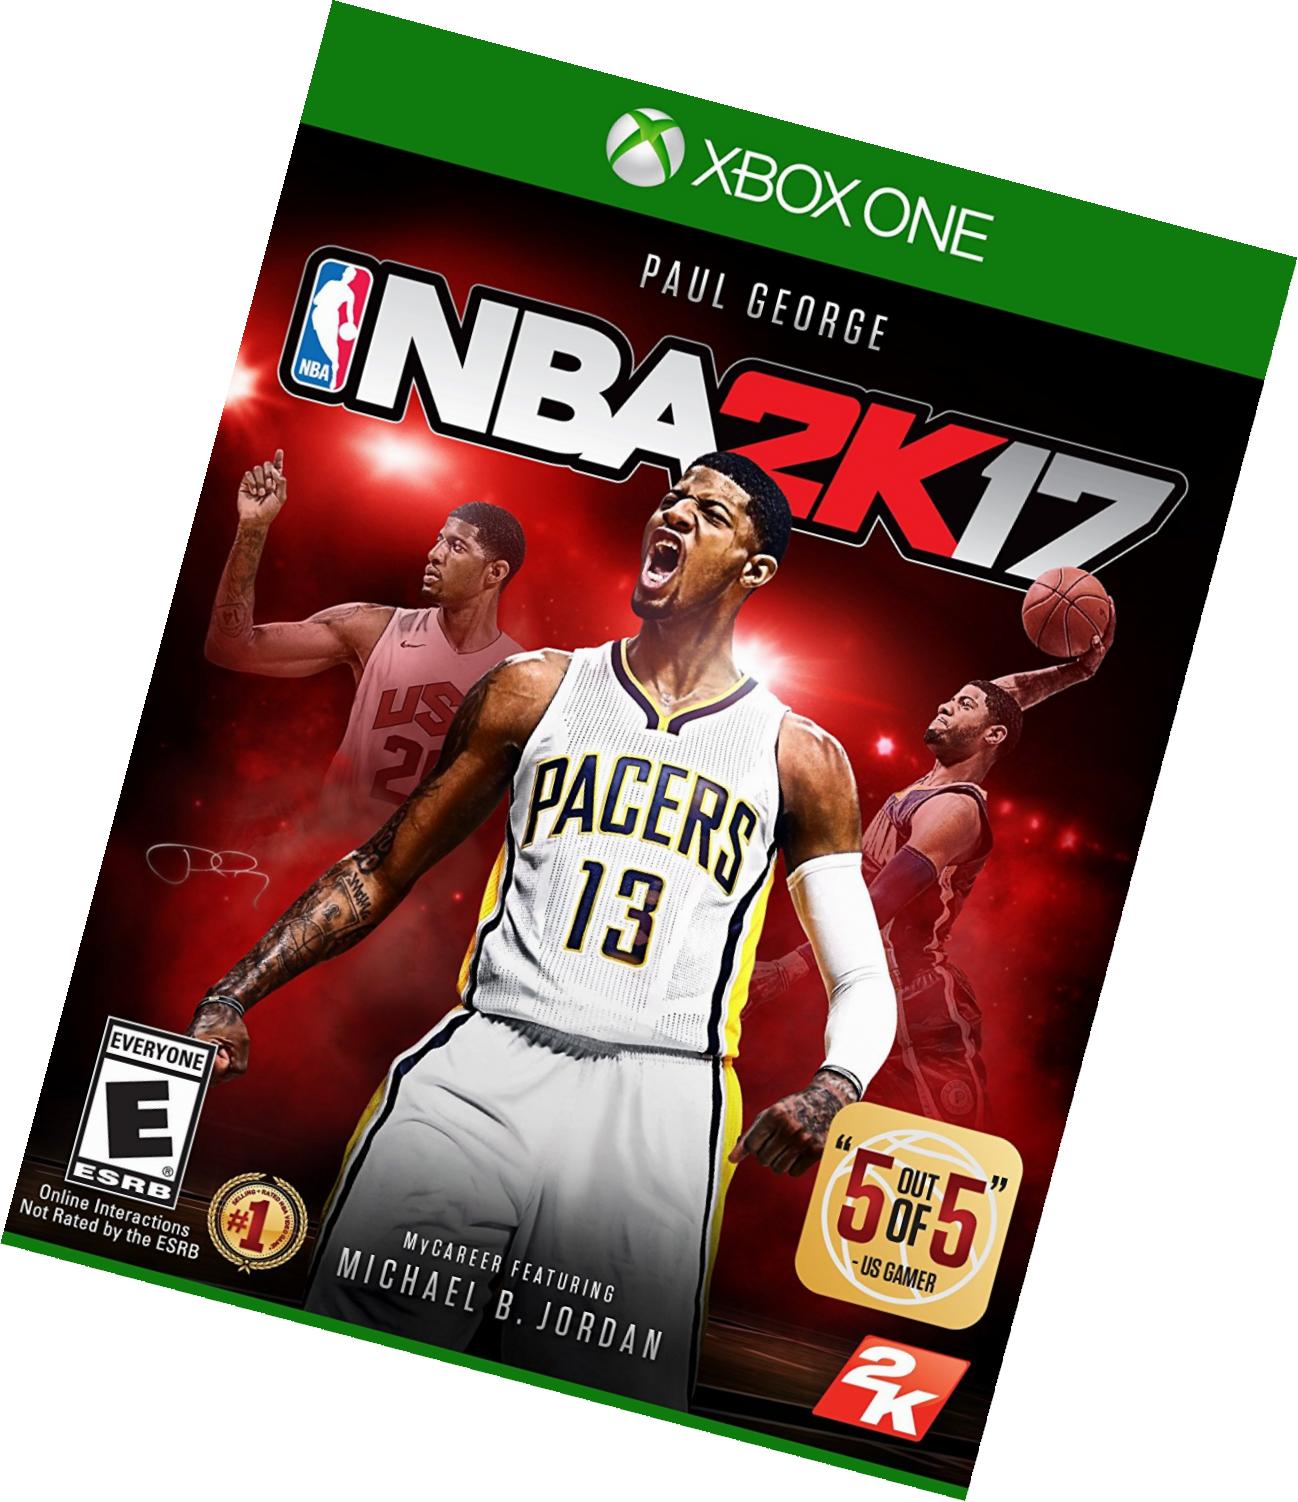 Mlb 2k15 For Xbox One Wwwtollebildcom